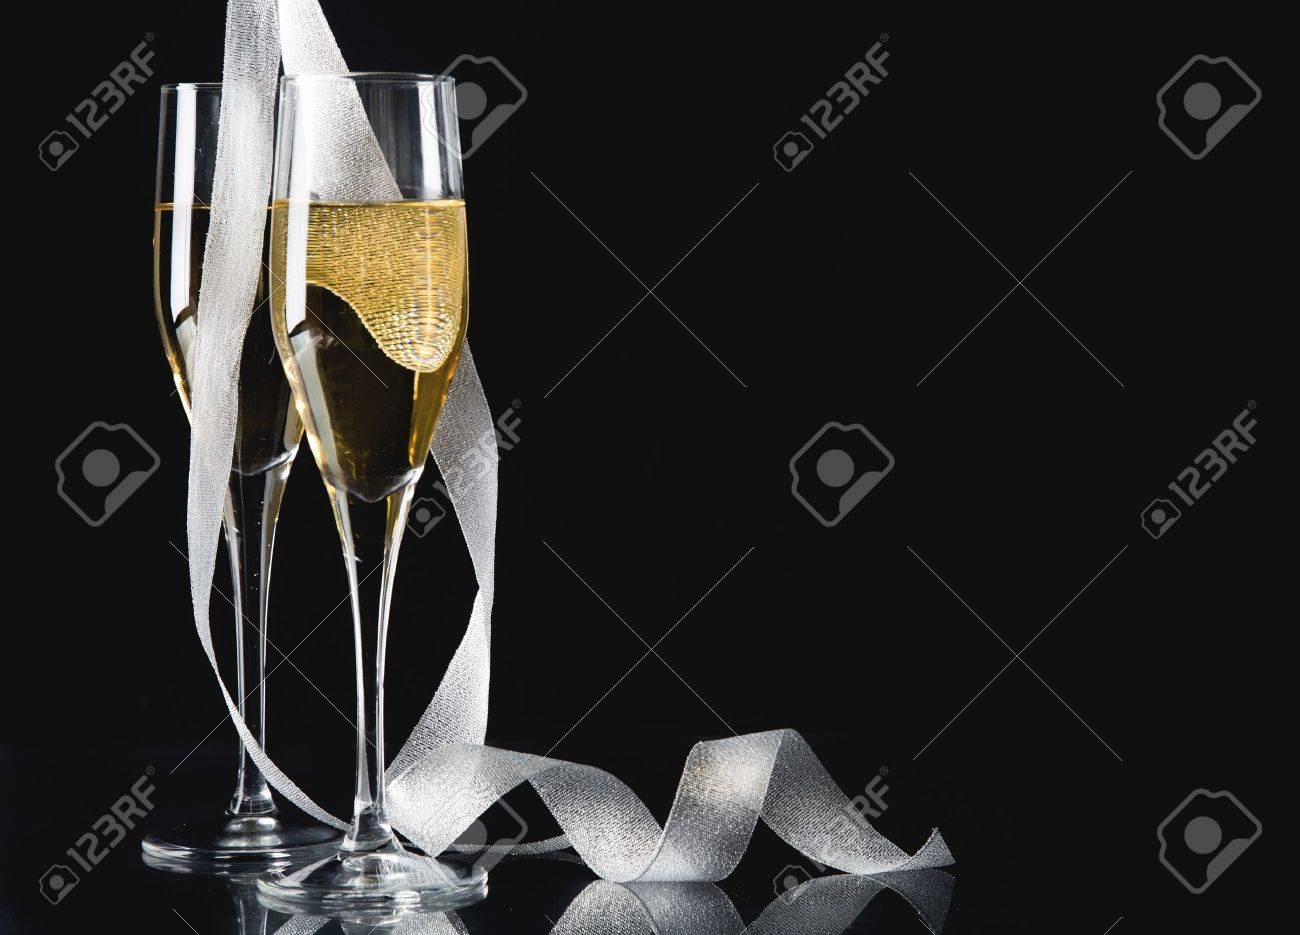 Champagne. Stock Photo - 50485611